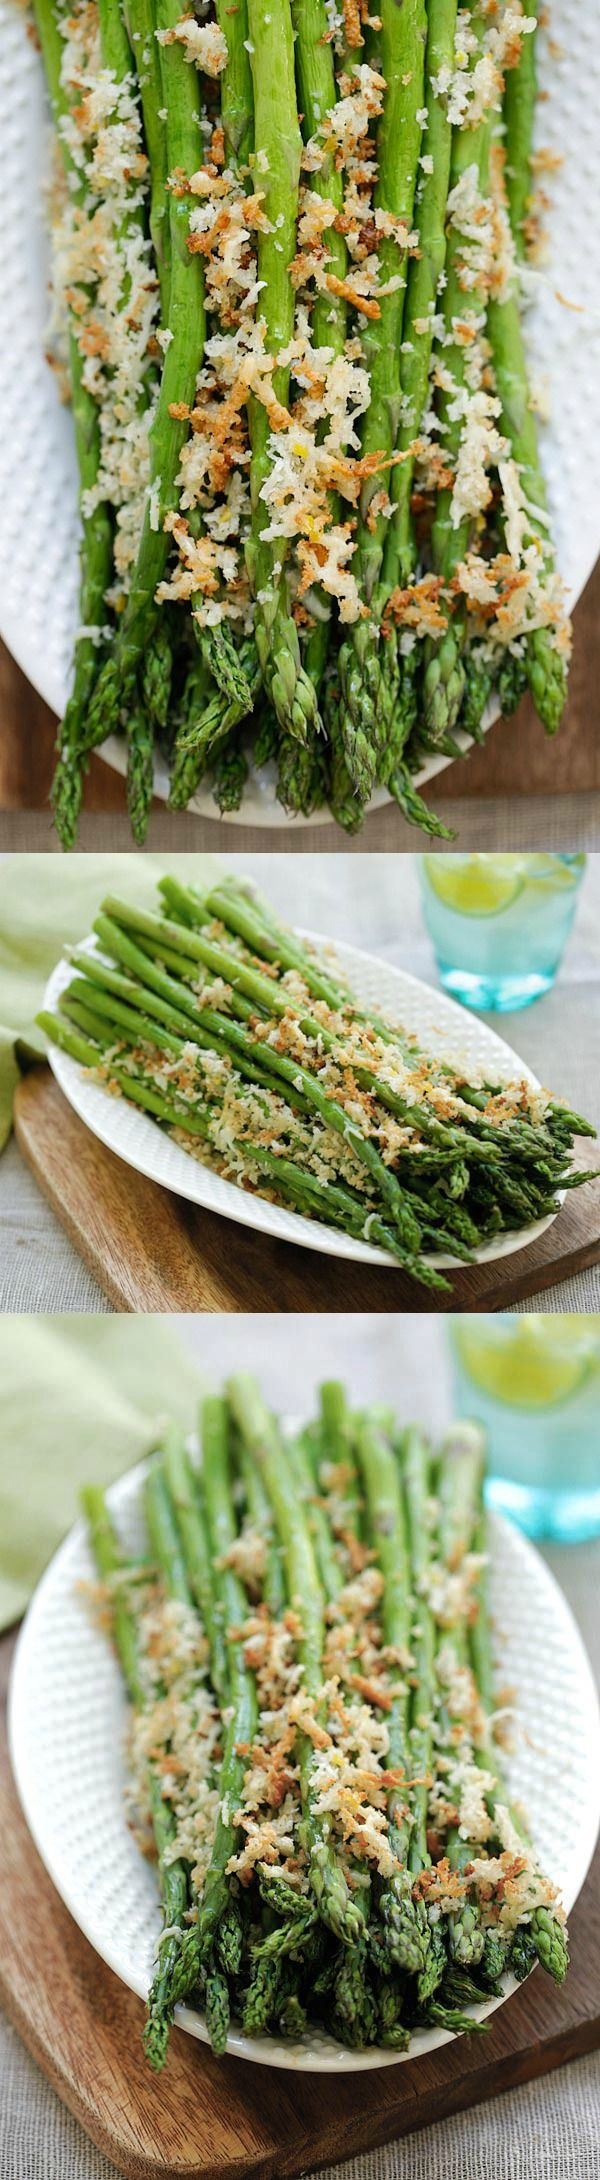 Asparagus With Lemon Parmesan Breadcrumbs  Easy Roasted Asparagus With  Crunchy Breadcrumbs With Lemon And Parmesan